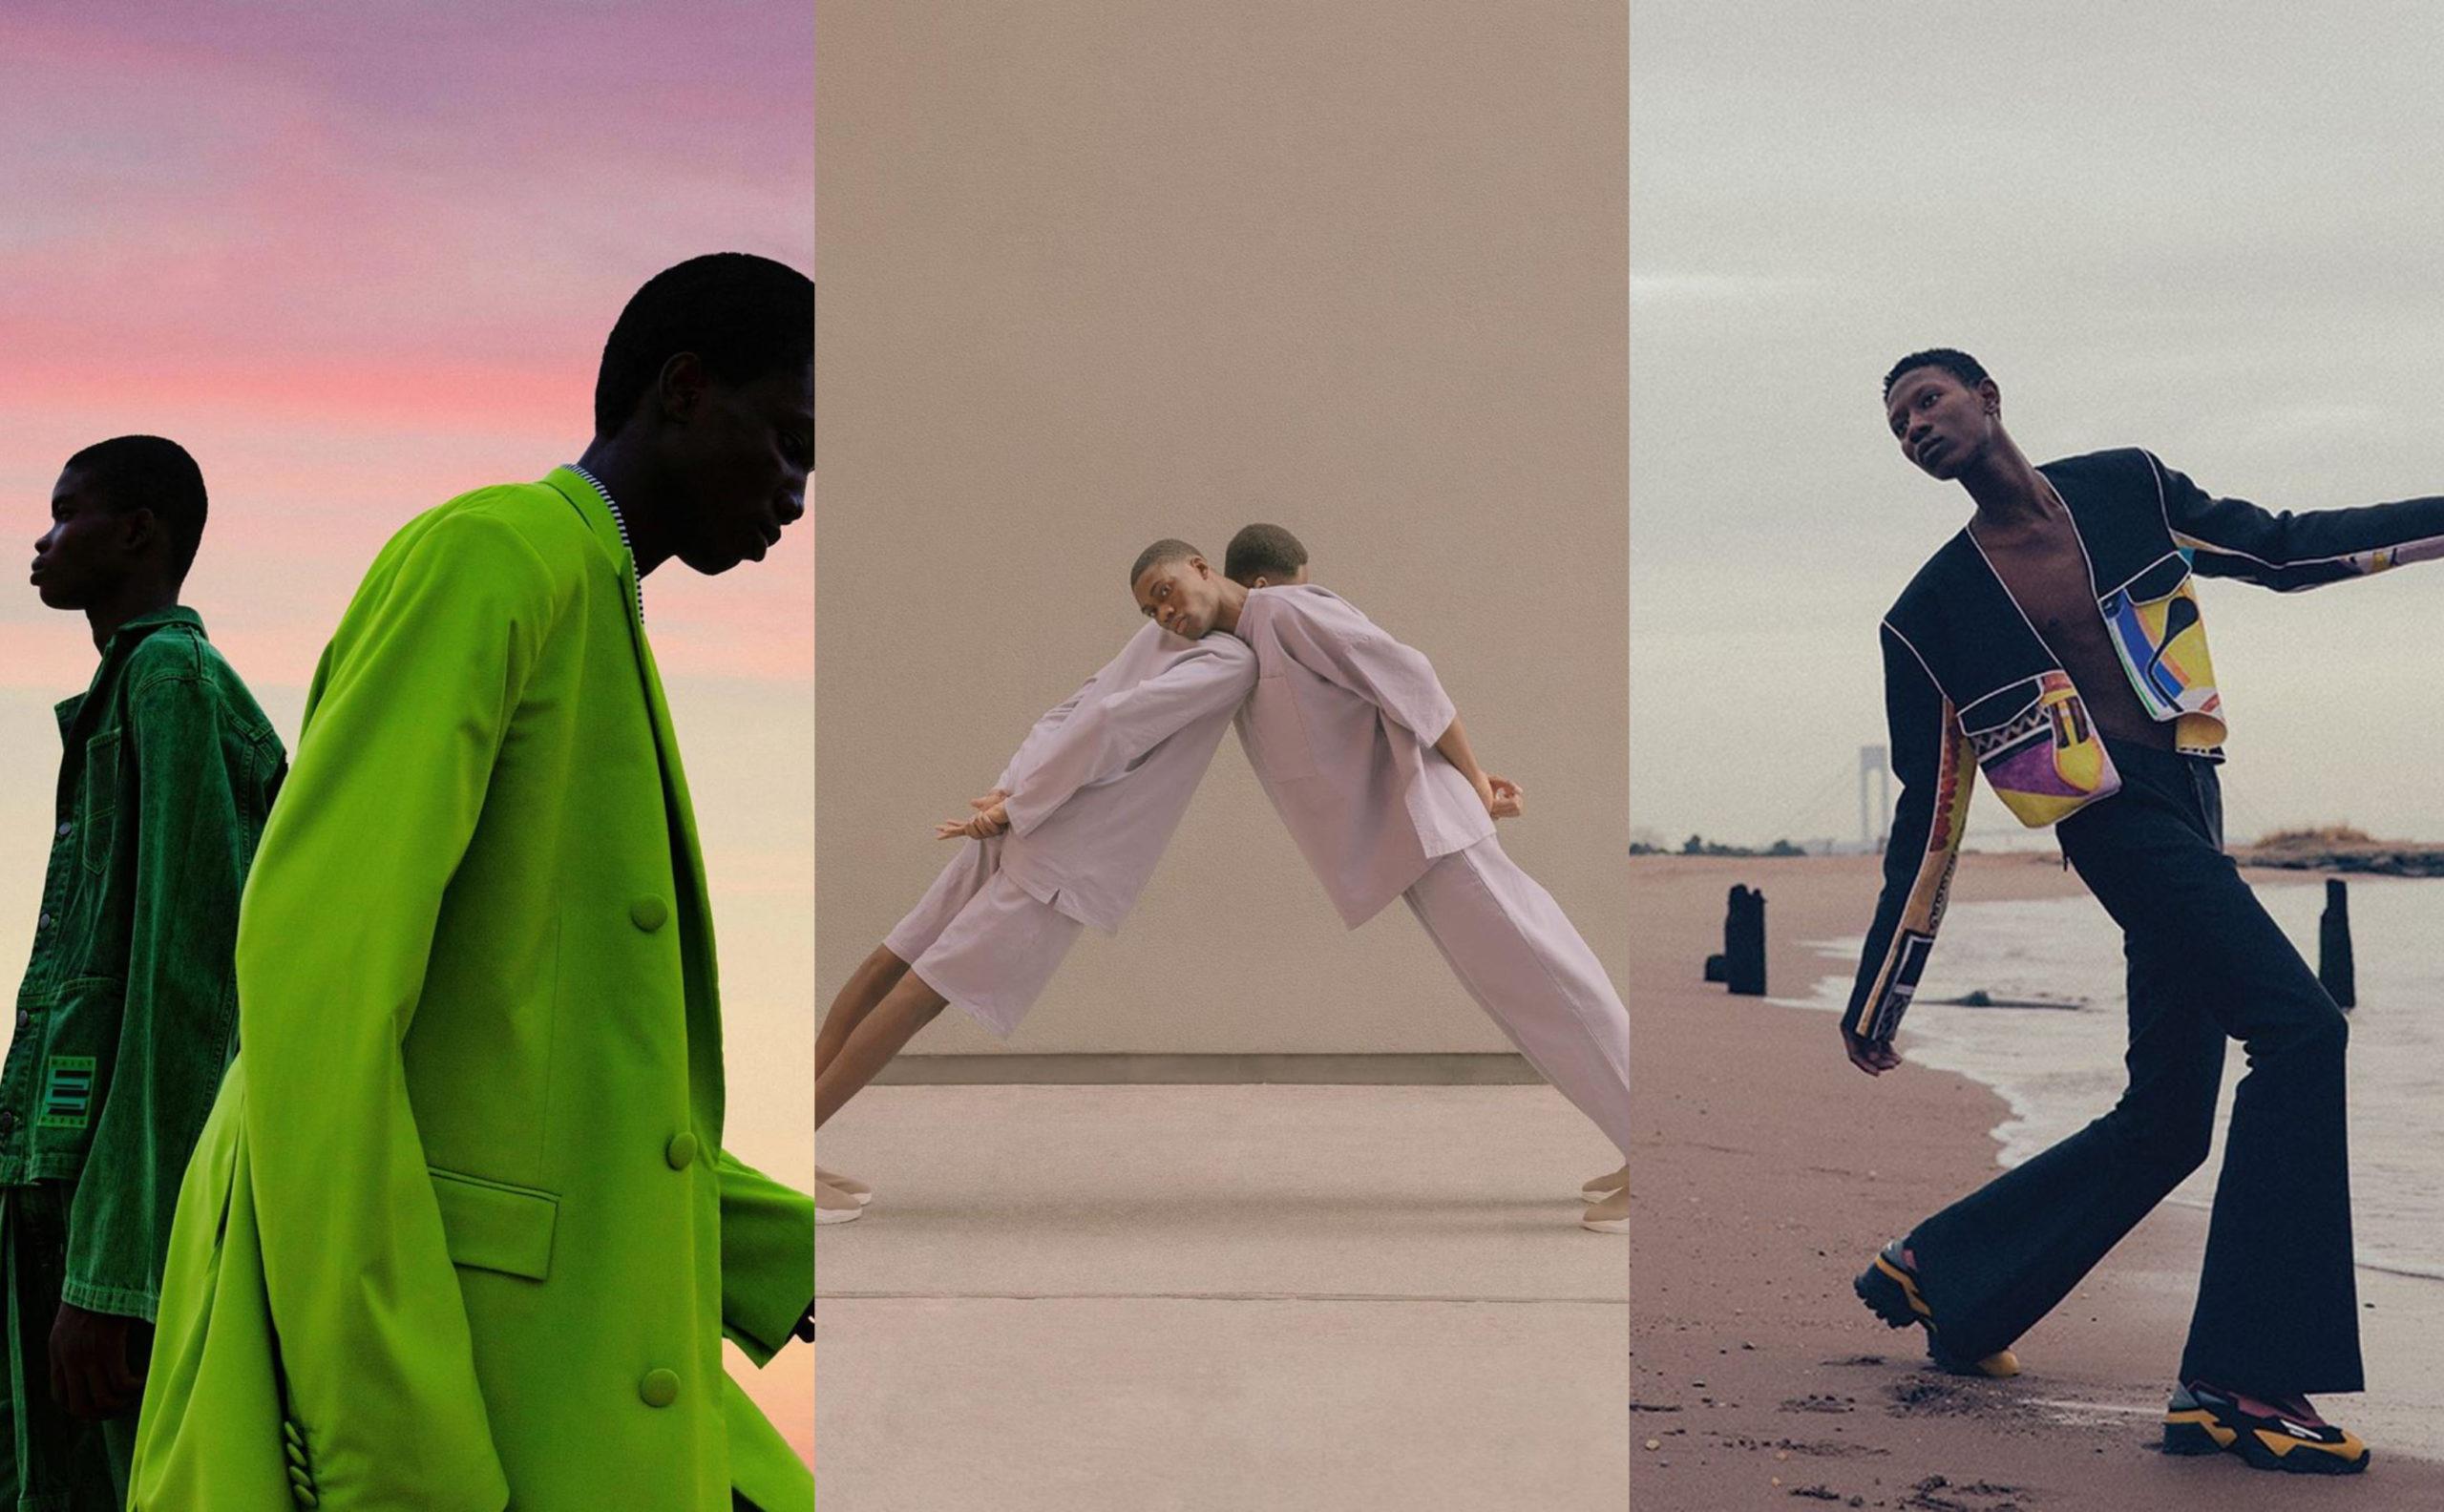 Spotlighting Innovative Black Designers to Support